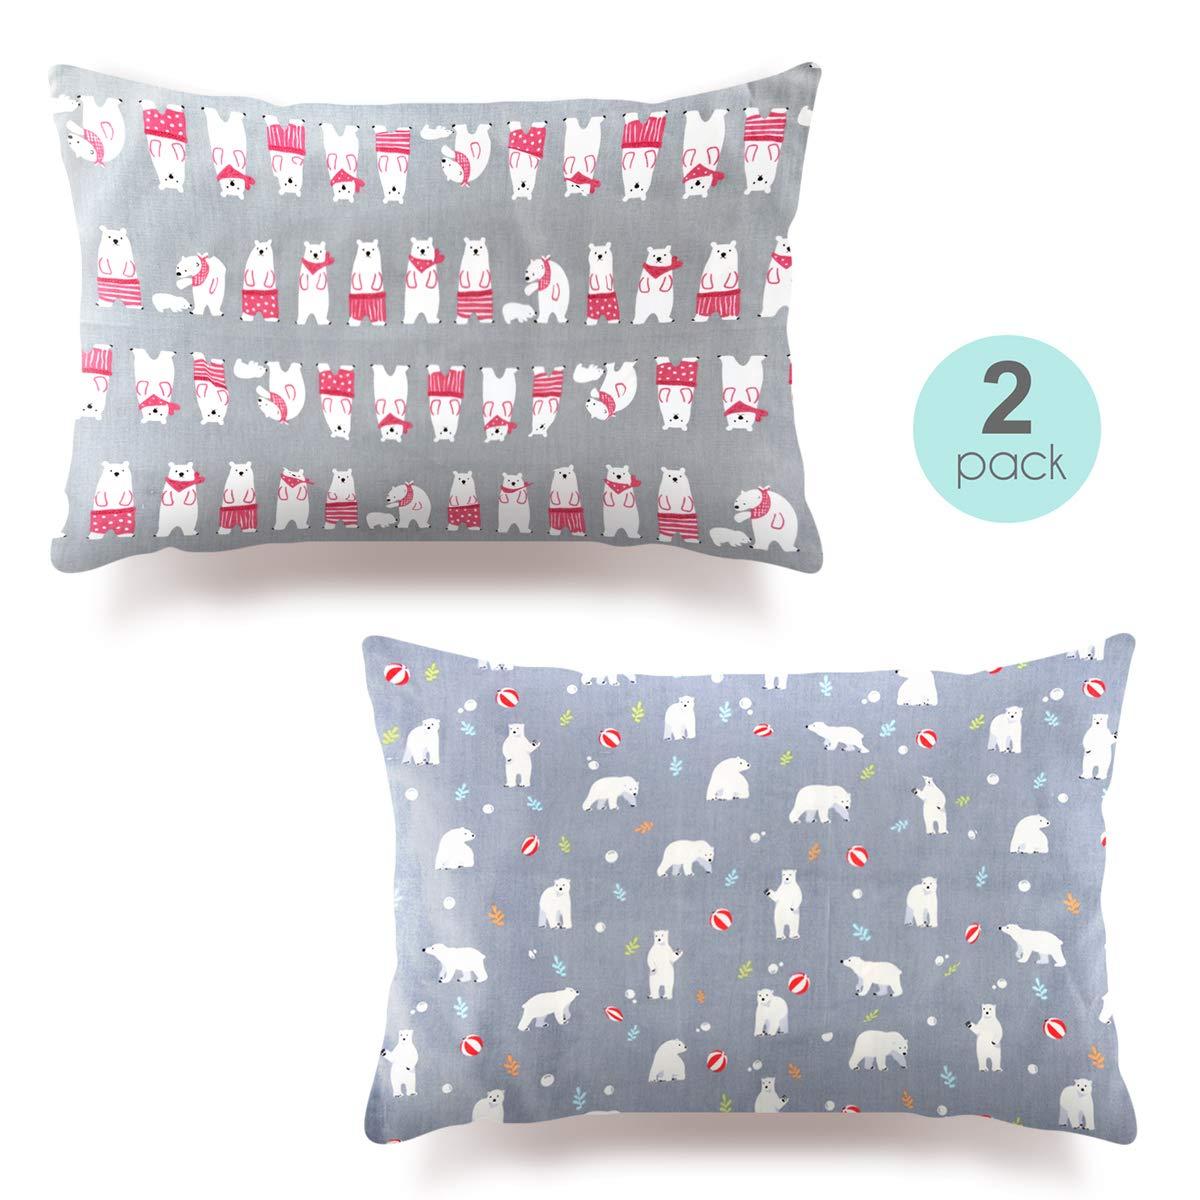 Kids Toddler Pillowcases-2 Pack Pillow Cover for Boys Girls Kids Bedding,Little Bear by COSMOPLUS